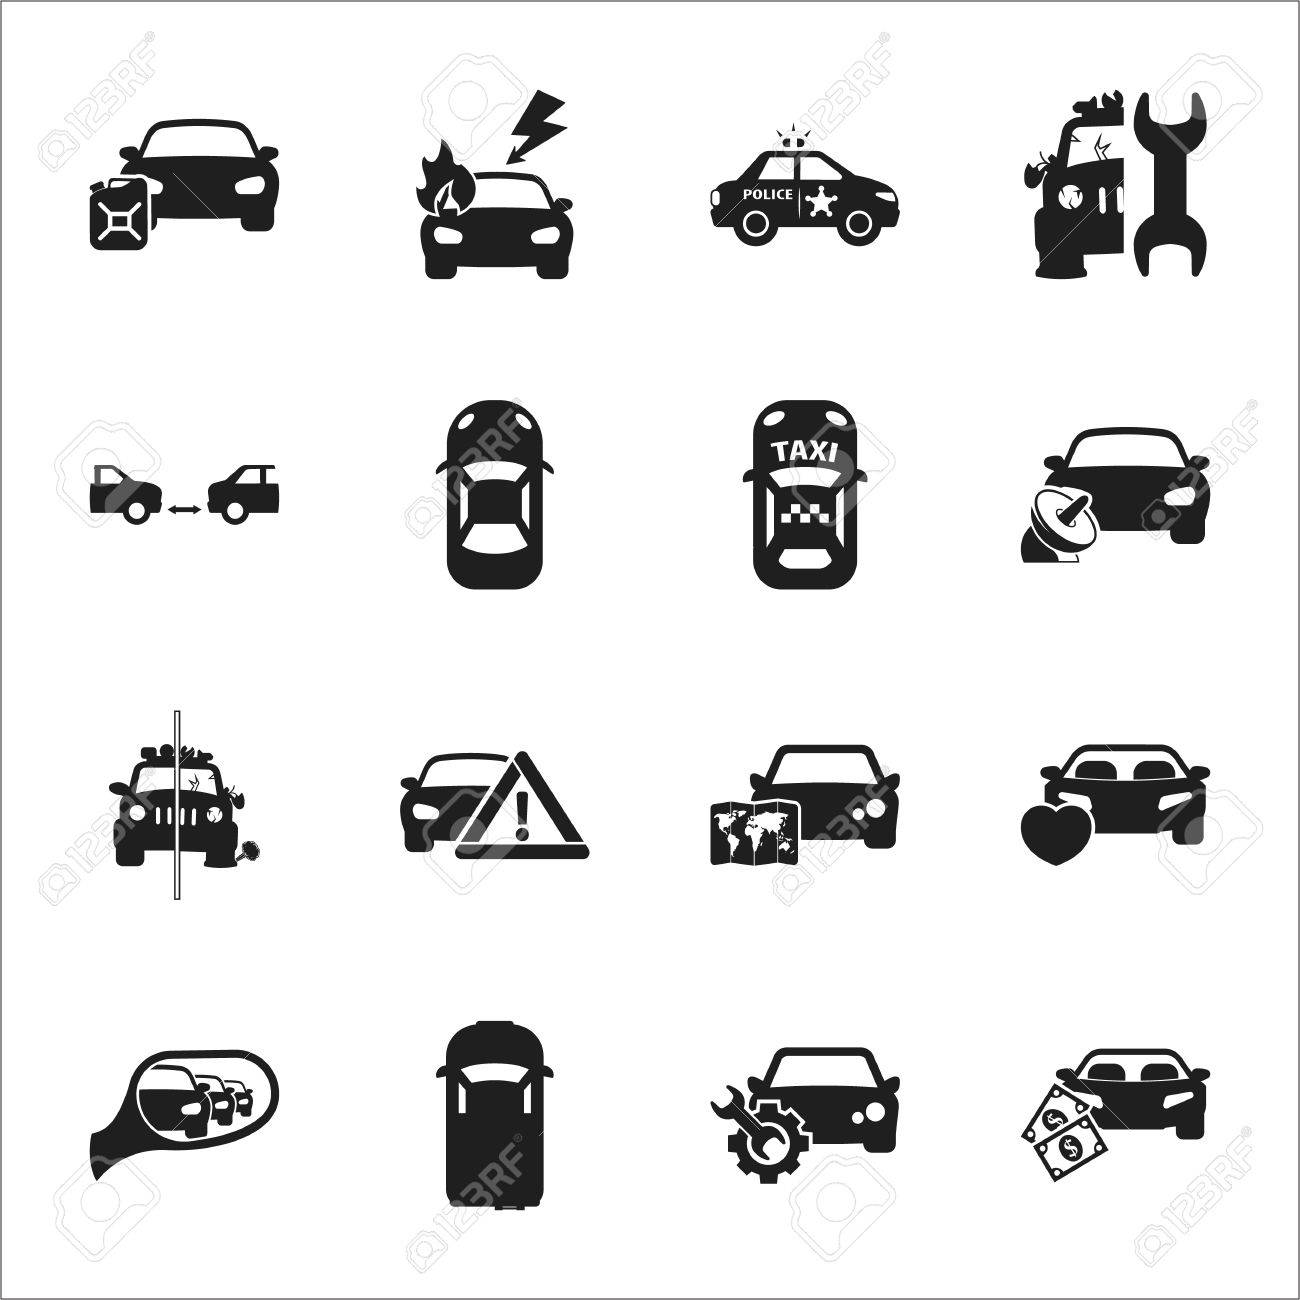 car, accident 16 black simple icons set for web design - 50451974